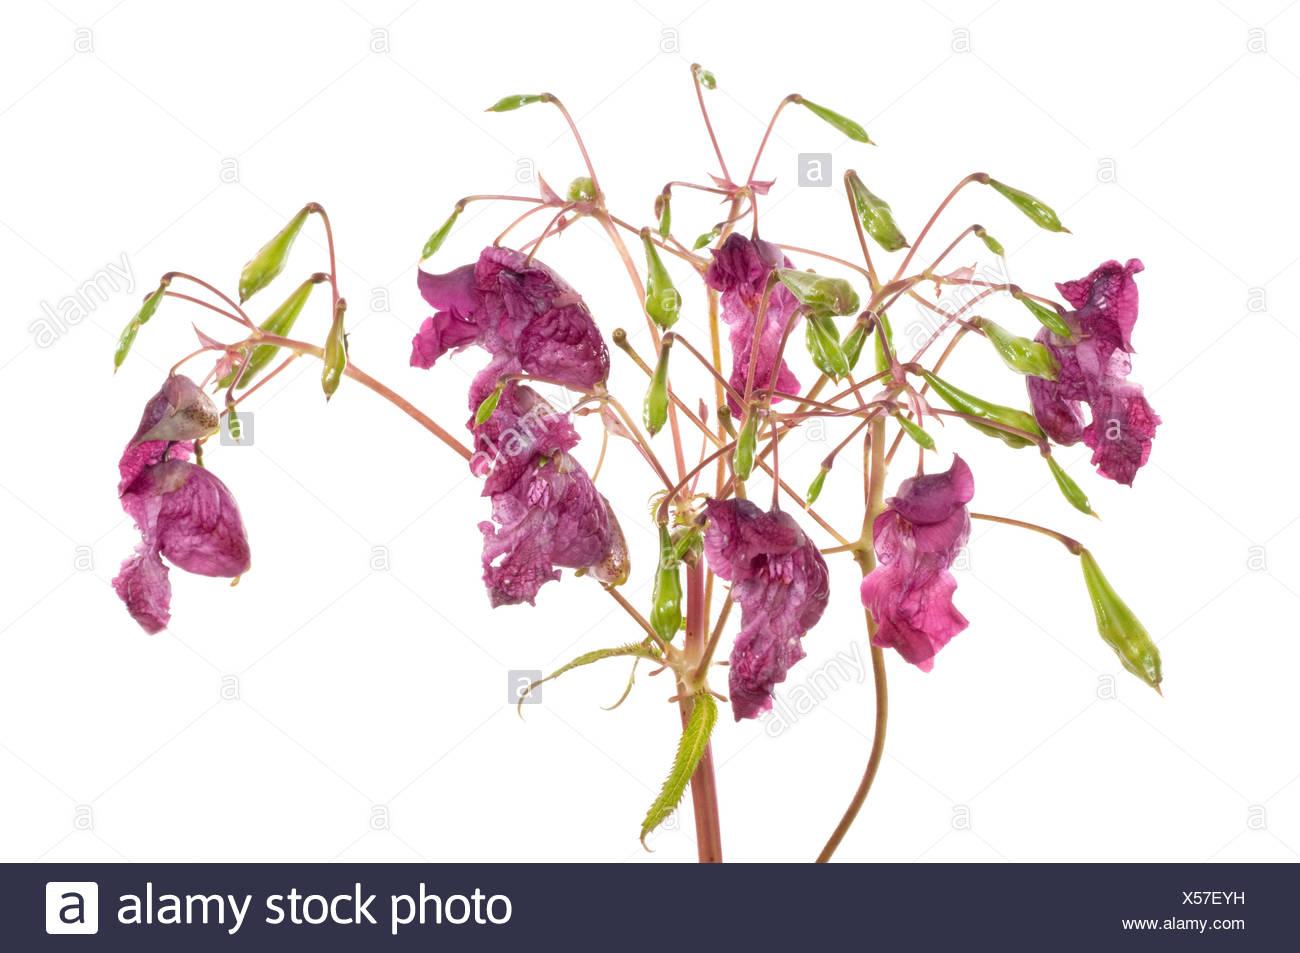 Indisches Springkraut / Himalayan Balsam Stock Photo